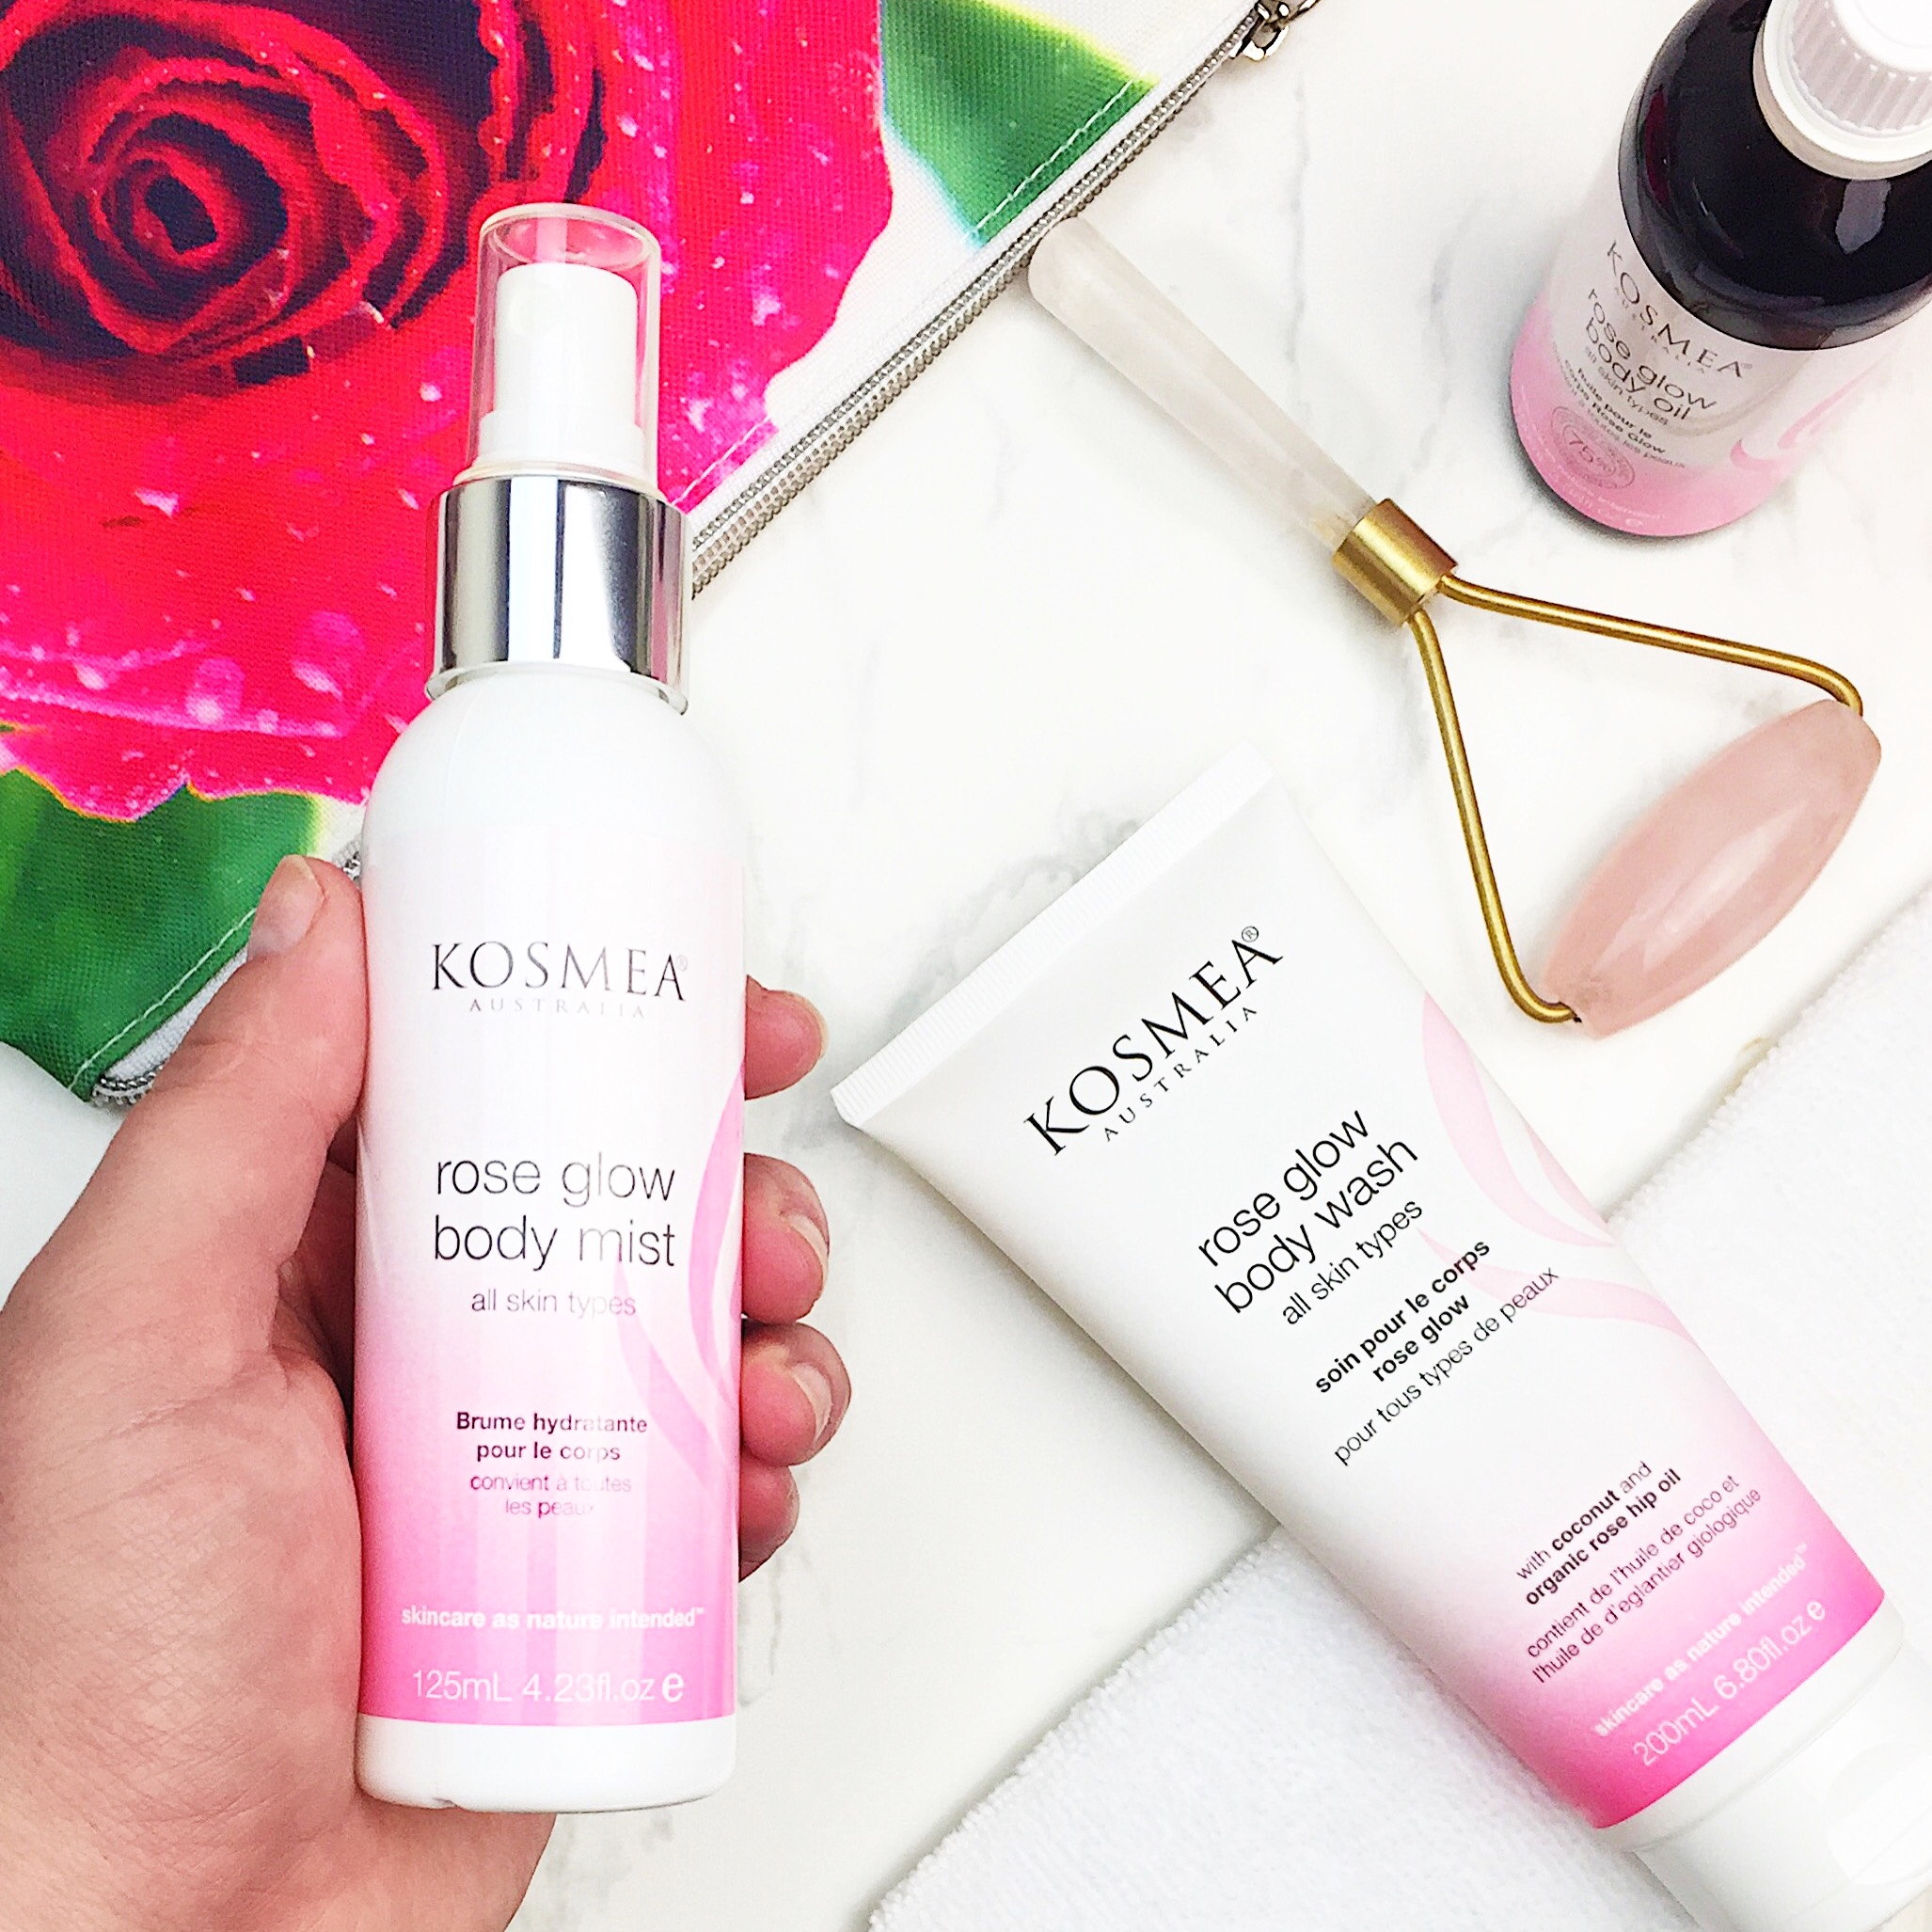 Marisa Robinson Beauty Blogger Kosmea Australia